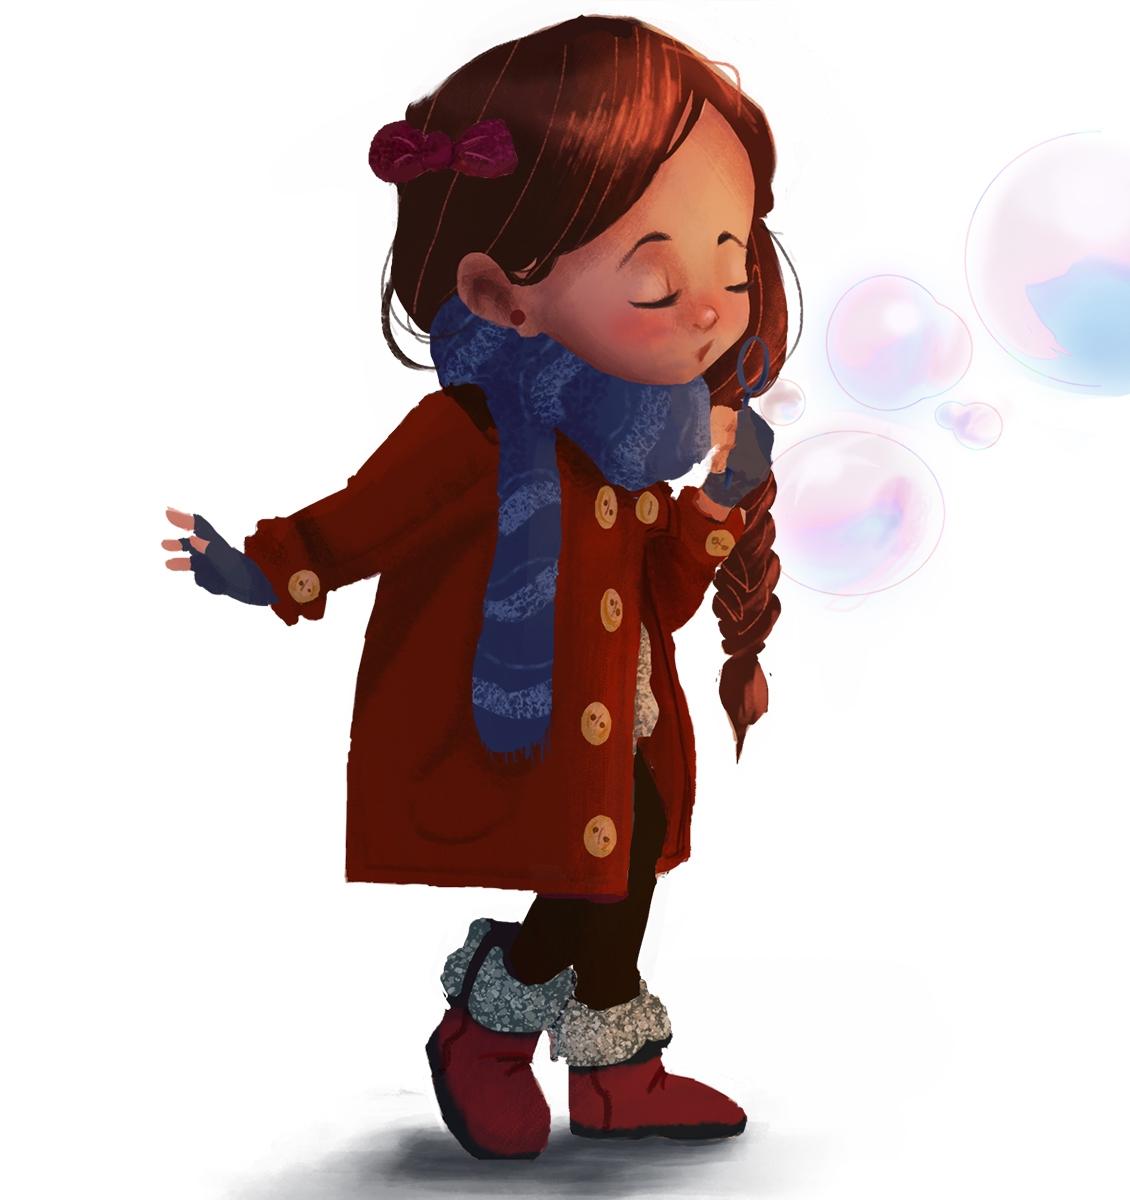 Acacia - characterdesign, kid, bubbles - acknebar | ello